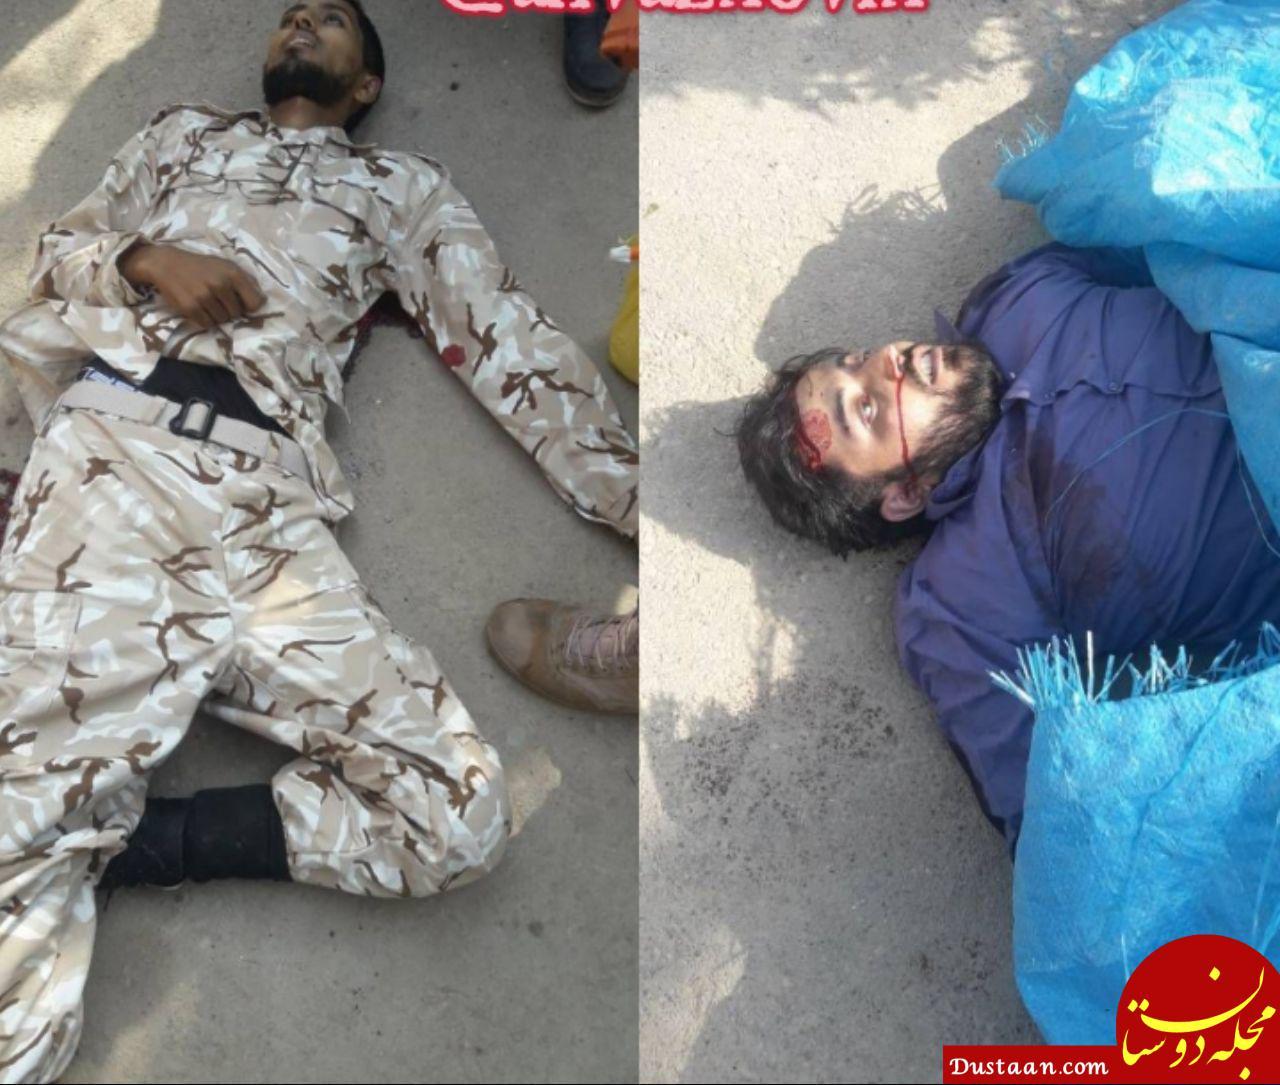 www.dustaan.com اولین تصویر منتشر شده از دو عضو گروهک تروریستی الاحواز